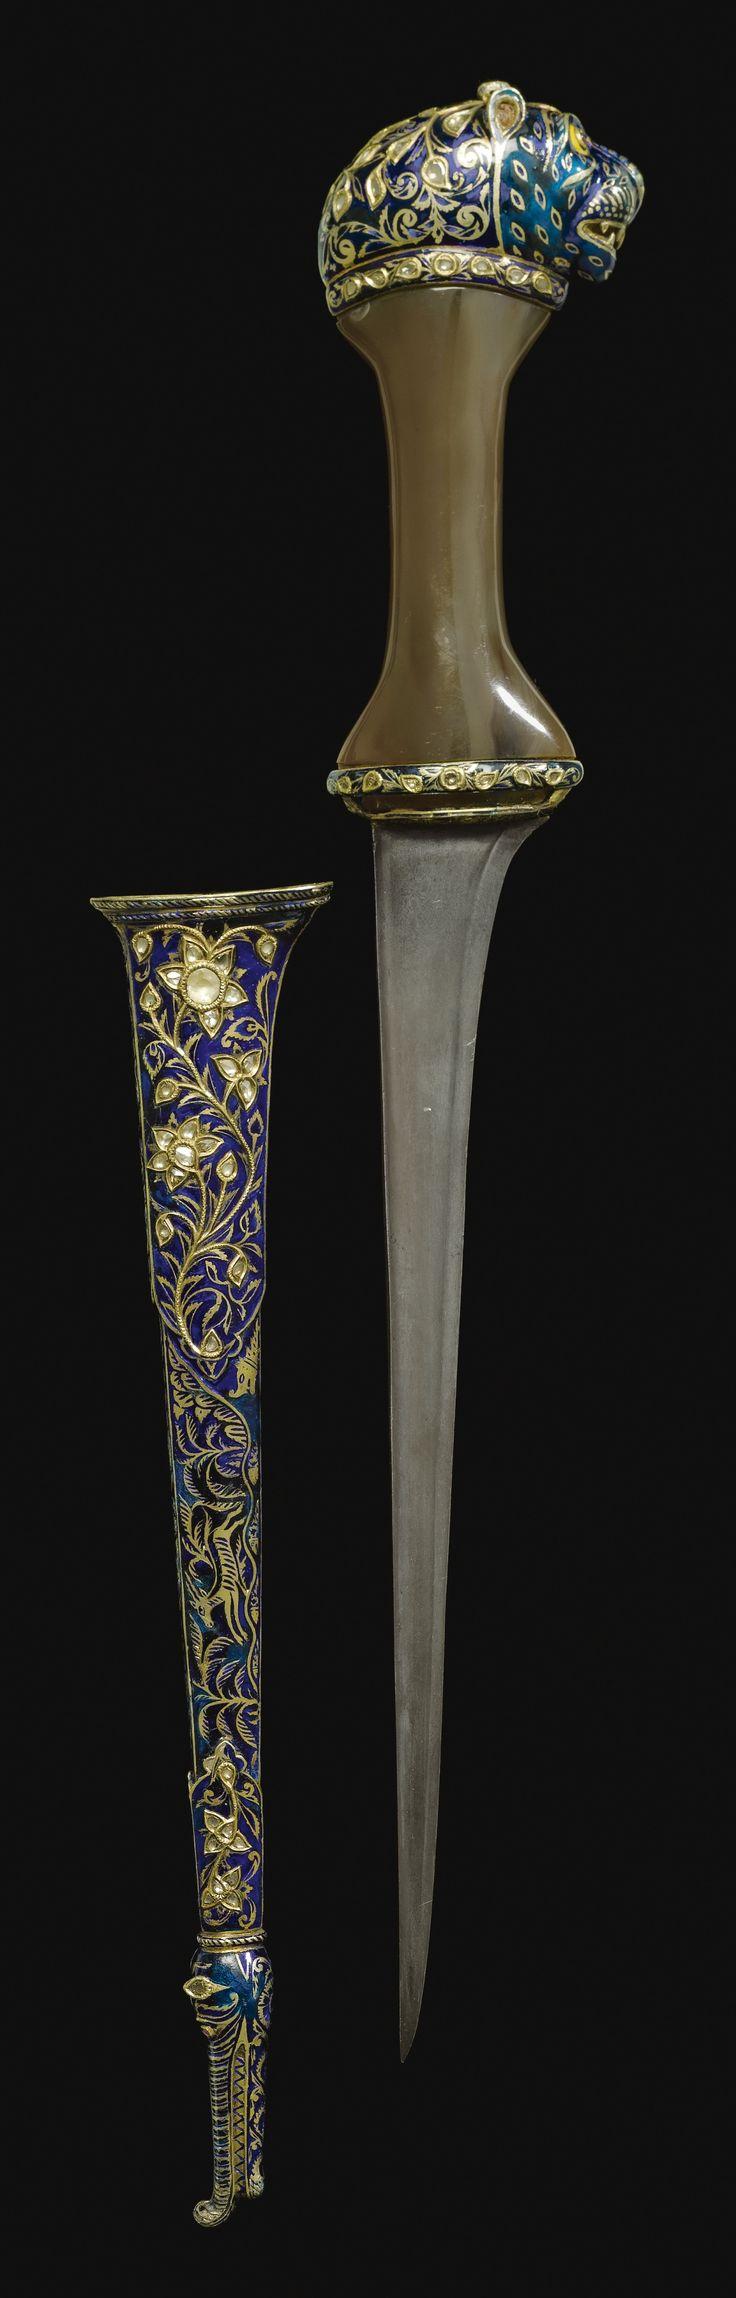 Puñal tipo estilete de la guardia del Sultán de Tipu - Seringapatam, India - C 1790.